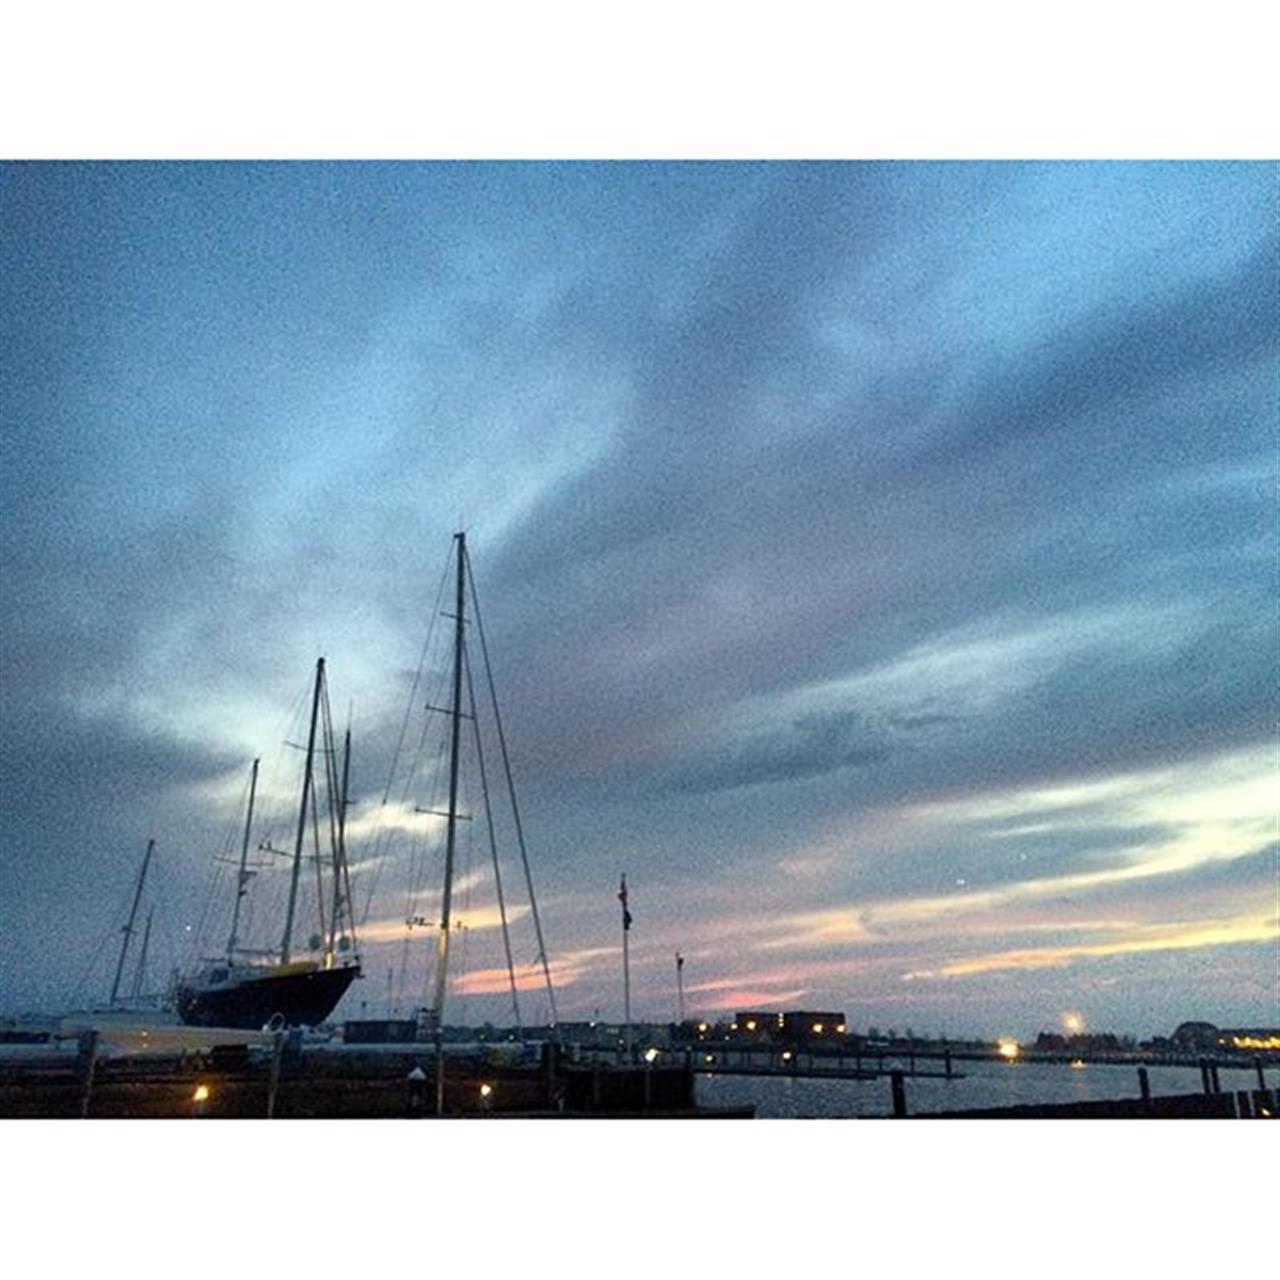 Sunset over America's sailing capital Newport Ri #newport #rhodeisland #oceanstate #littlerhody #travel #sail #luxurylife #ocean #water #saltlife #leadingRE #christiesgreatestates #beauty #perfect #enjoylife